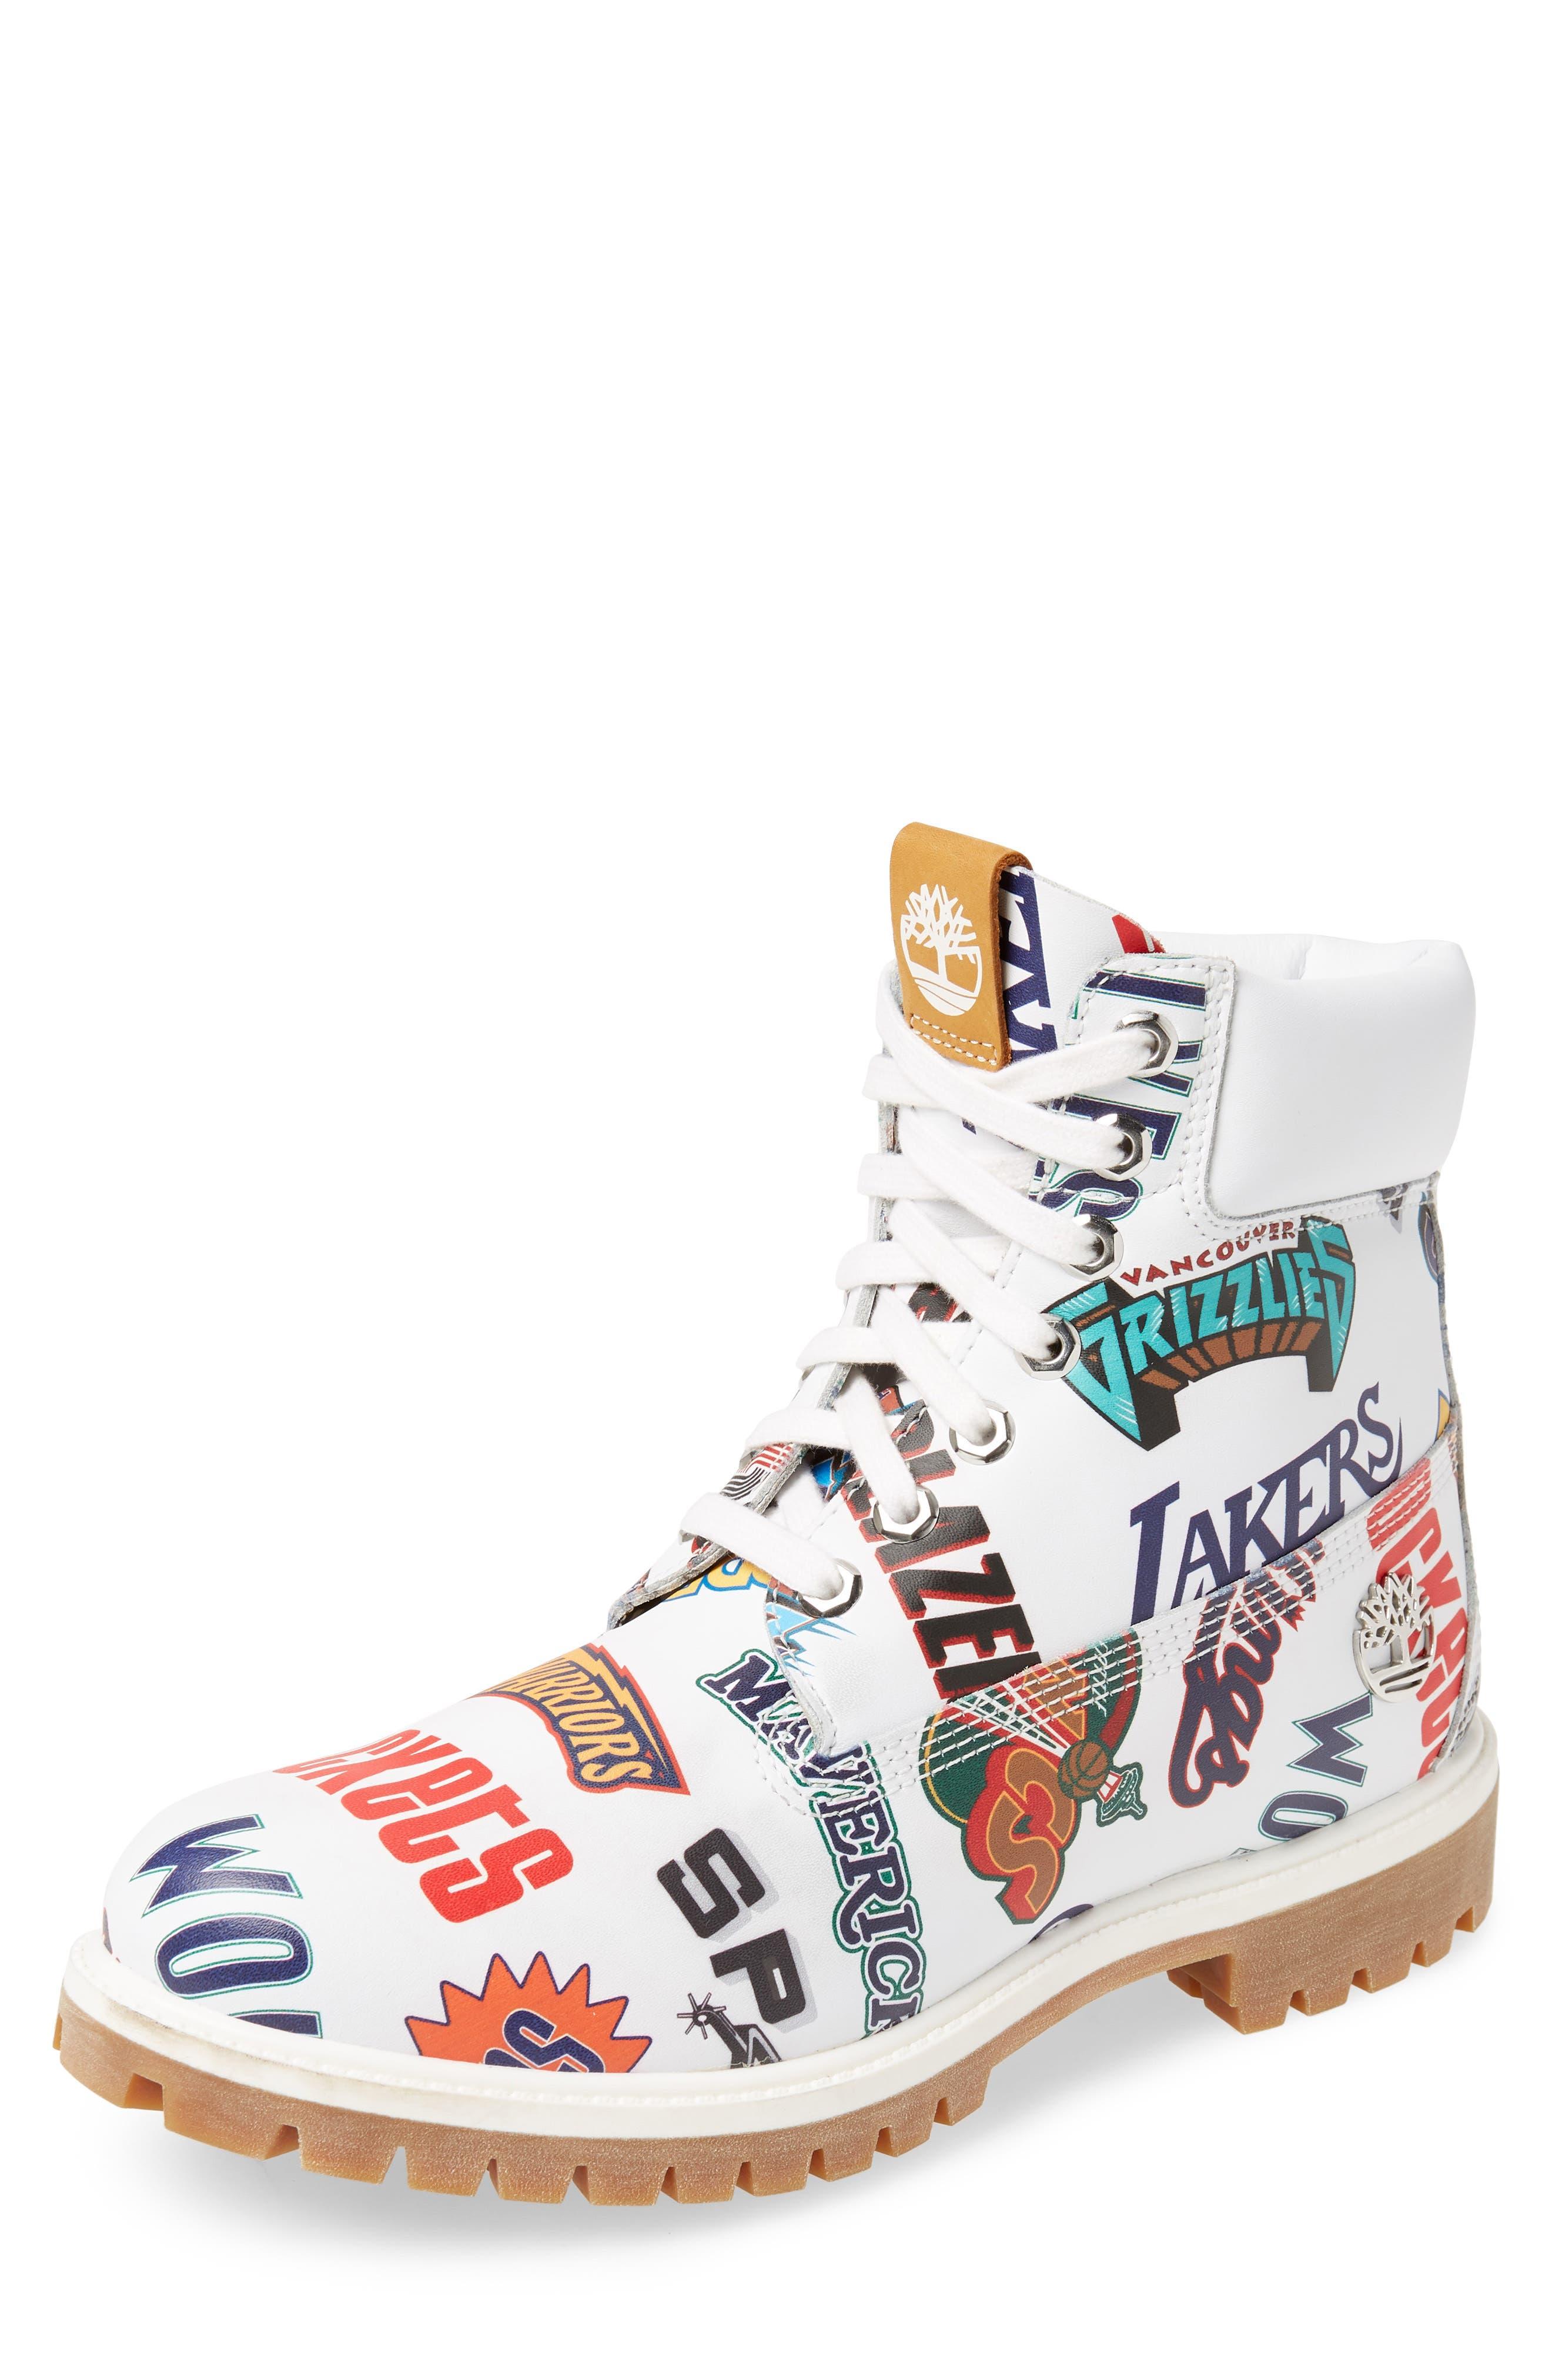 Timberland Premium Nba Collection Boot, White